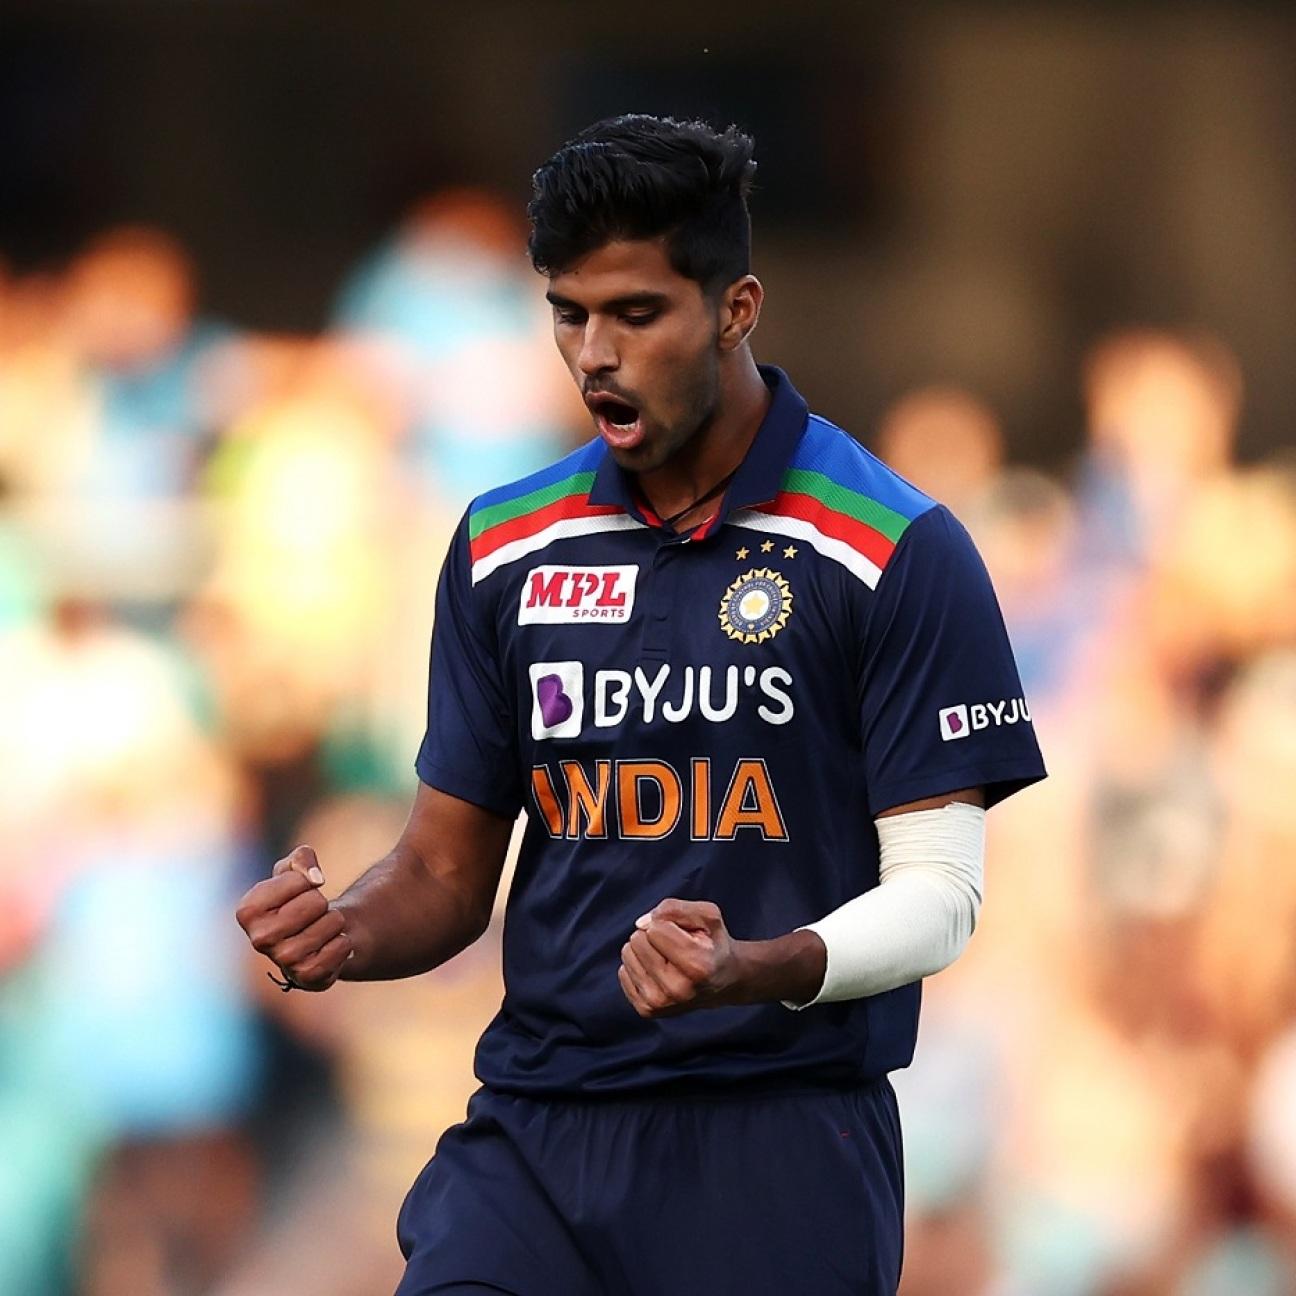 Brisbane Test - T Natarajan and Washington Sundar - a tale of friendship and freakish Test debuts